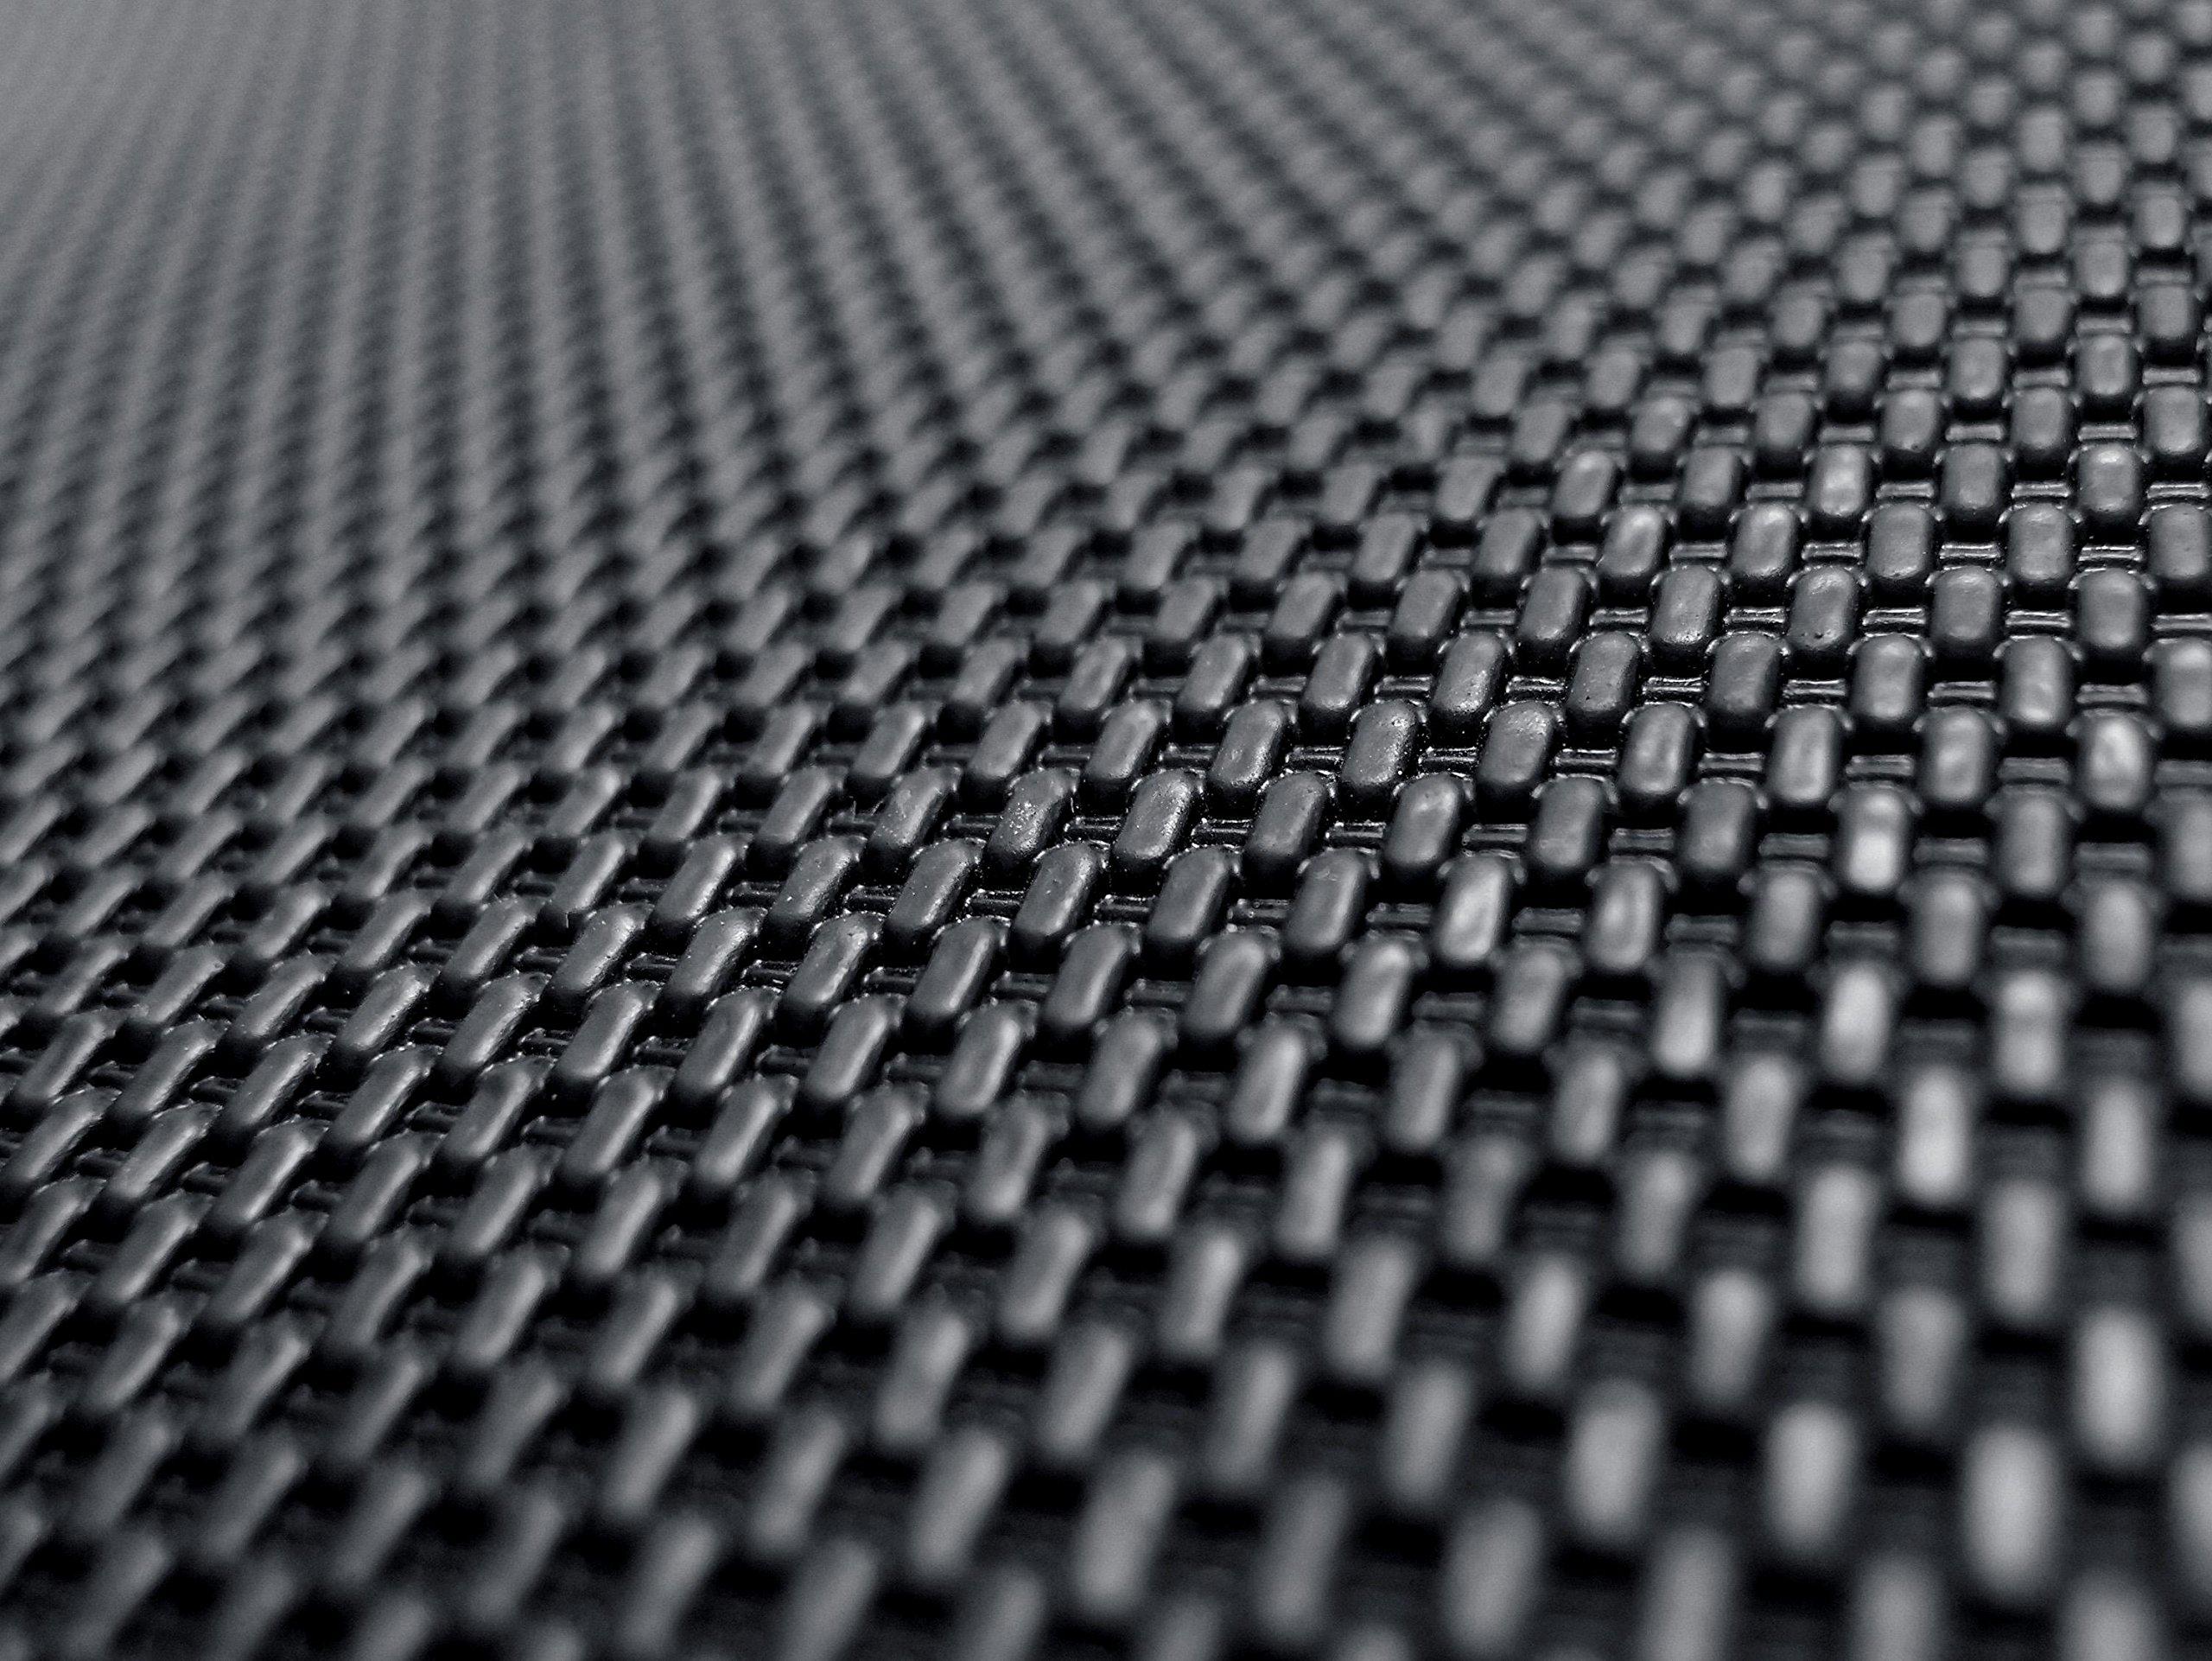 Kagu Rubber Tan Models 3D MAXpider Cargo Custom Fit All-Weather Floor Mat for Select BMW 3 Series Sedan E90